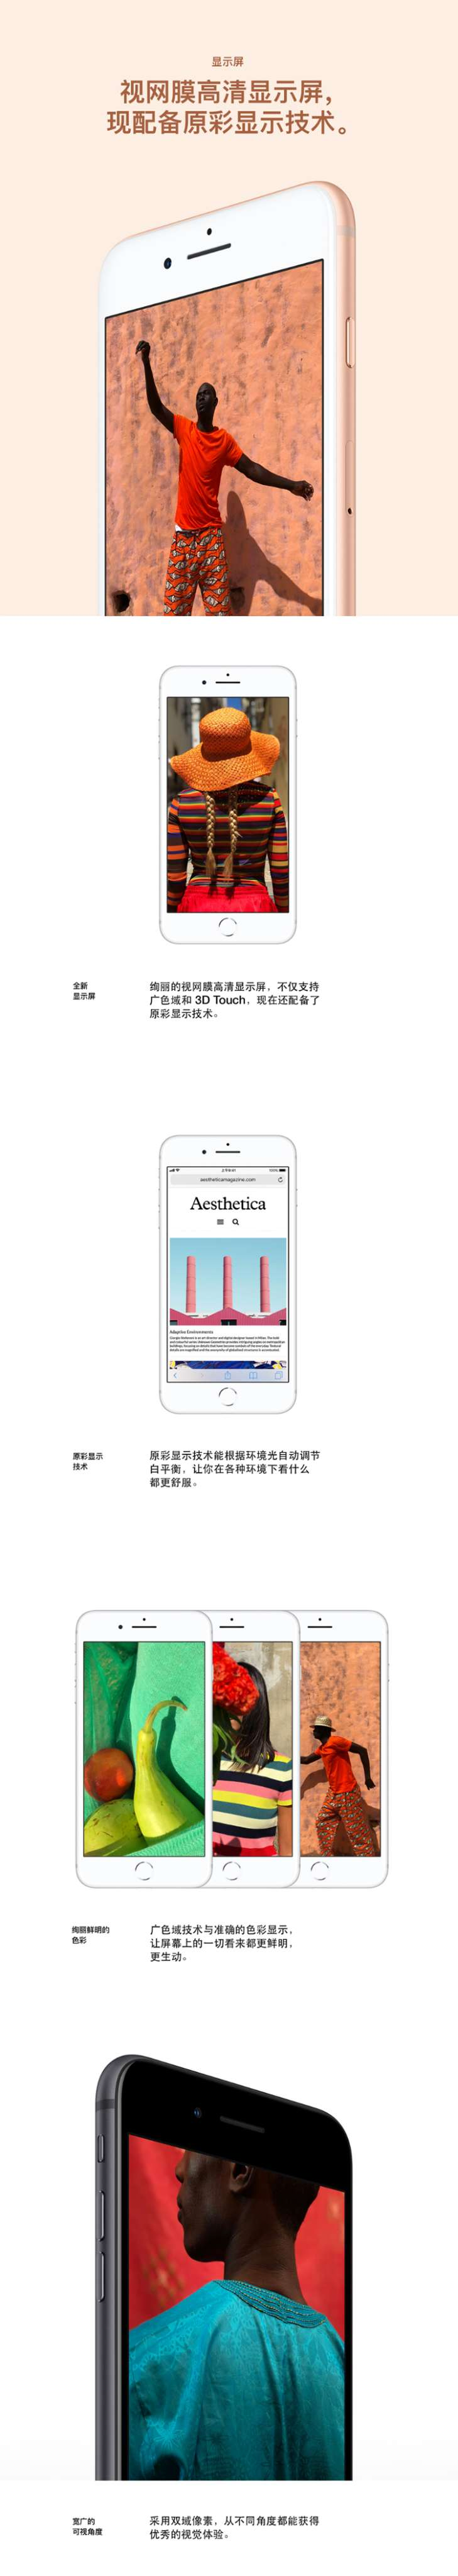 iPhone8pic3.jpg